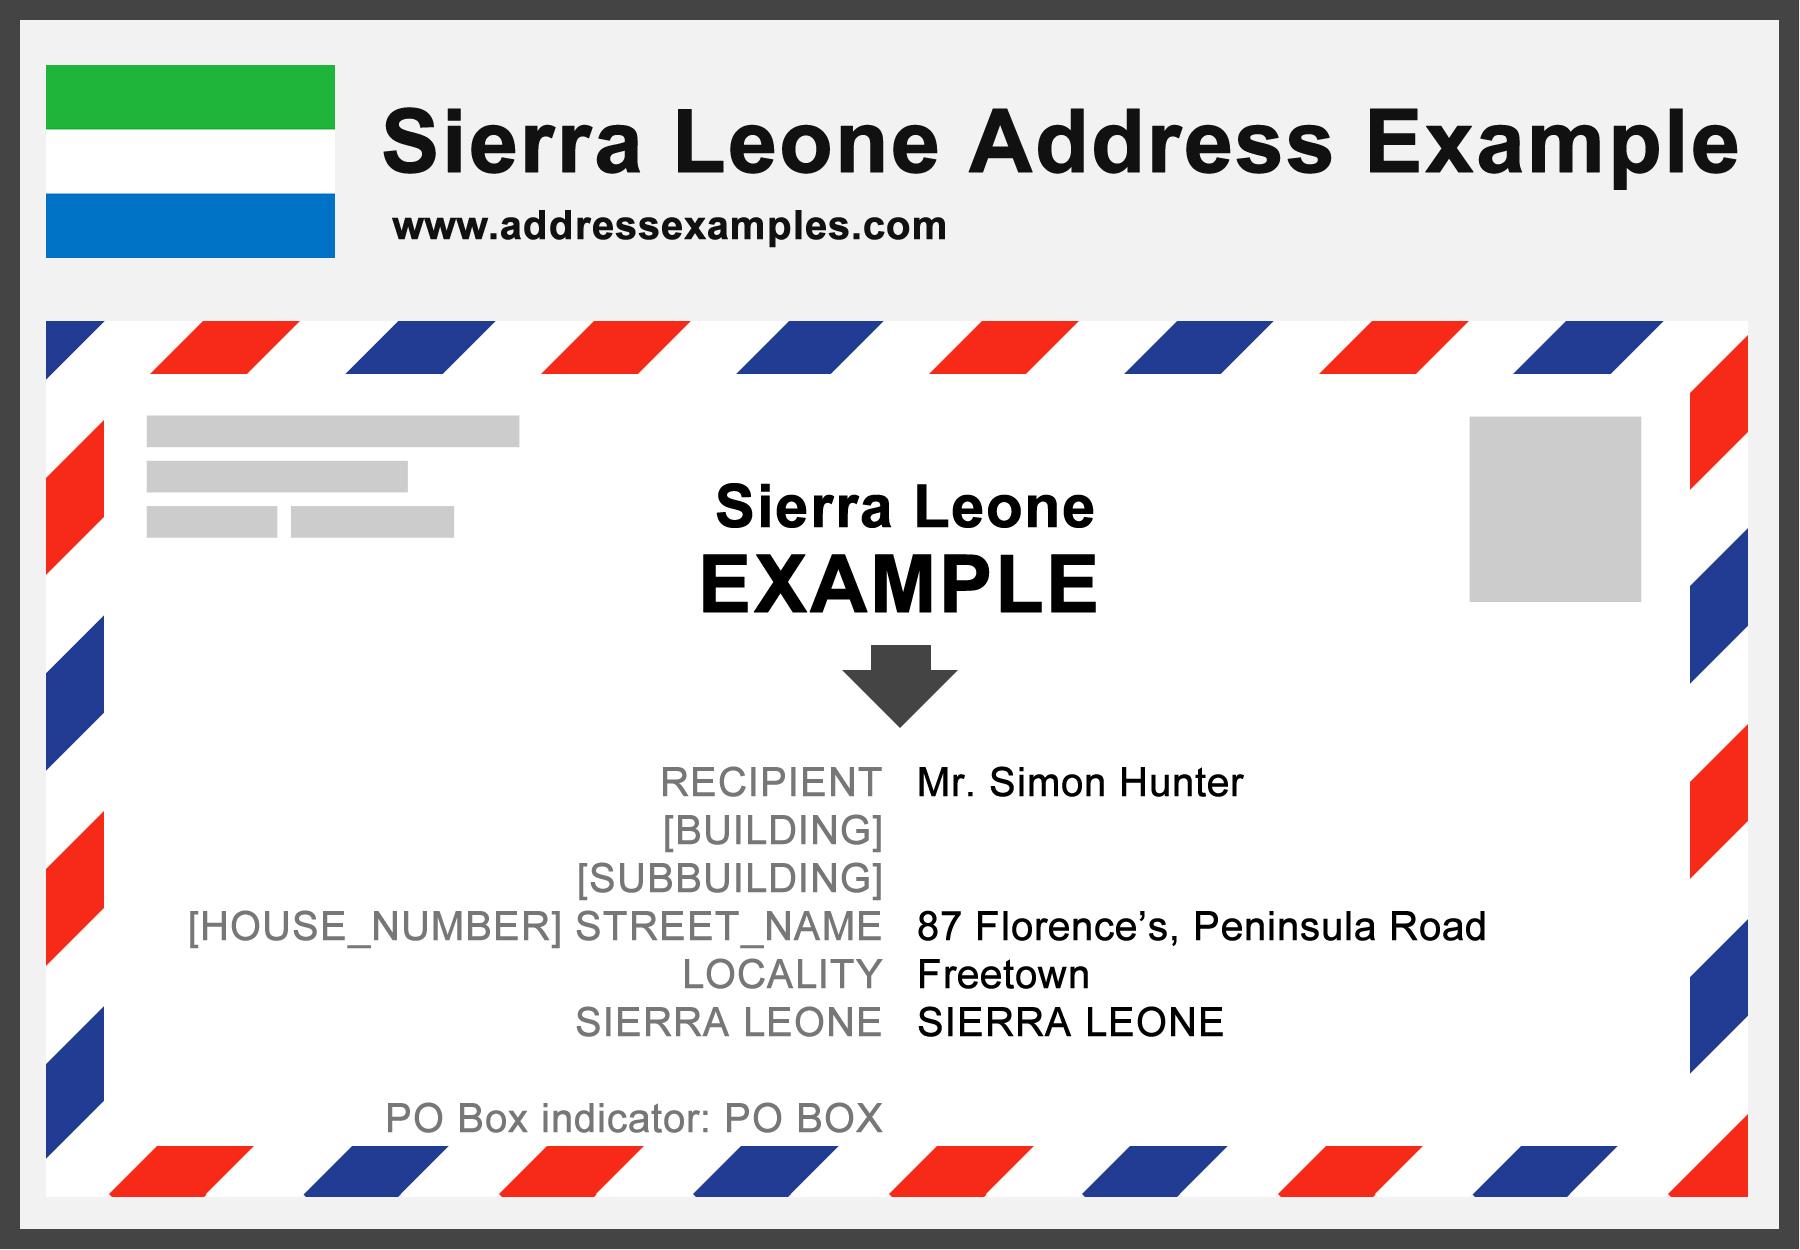 Sierra Leone Address Example